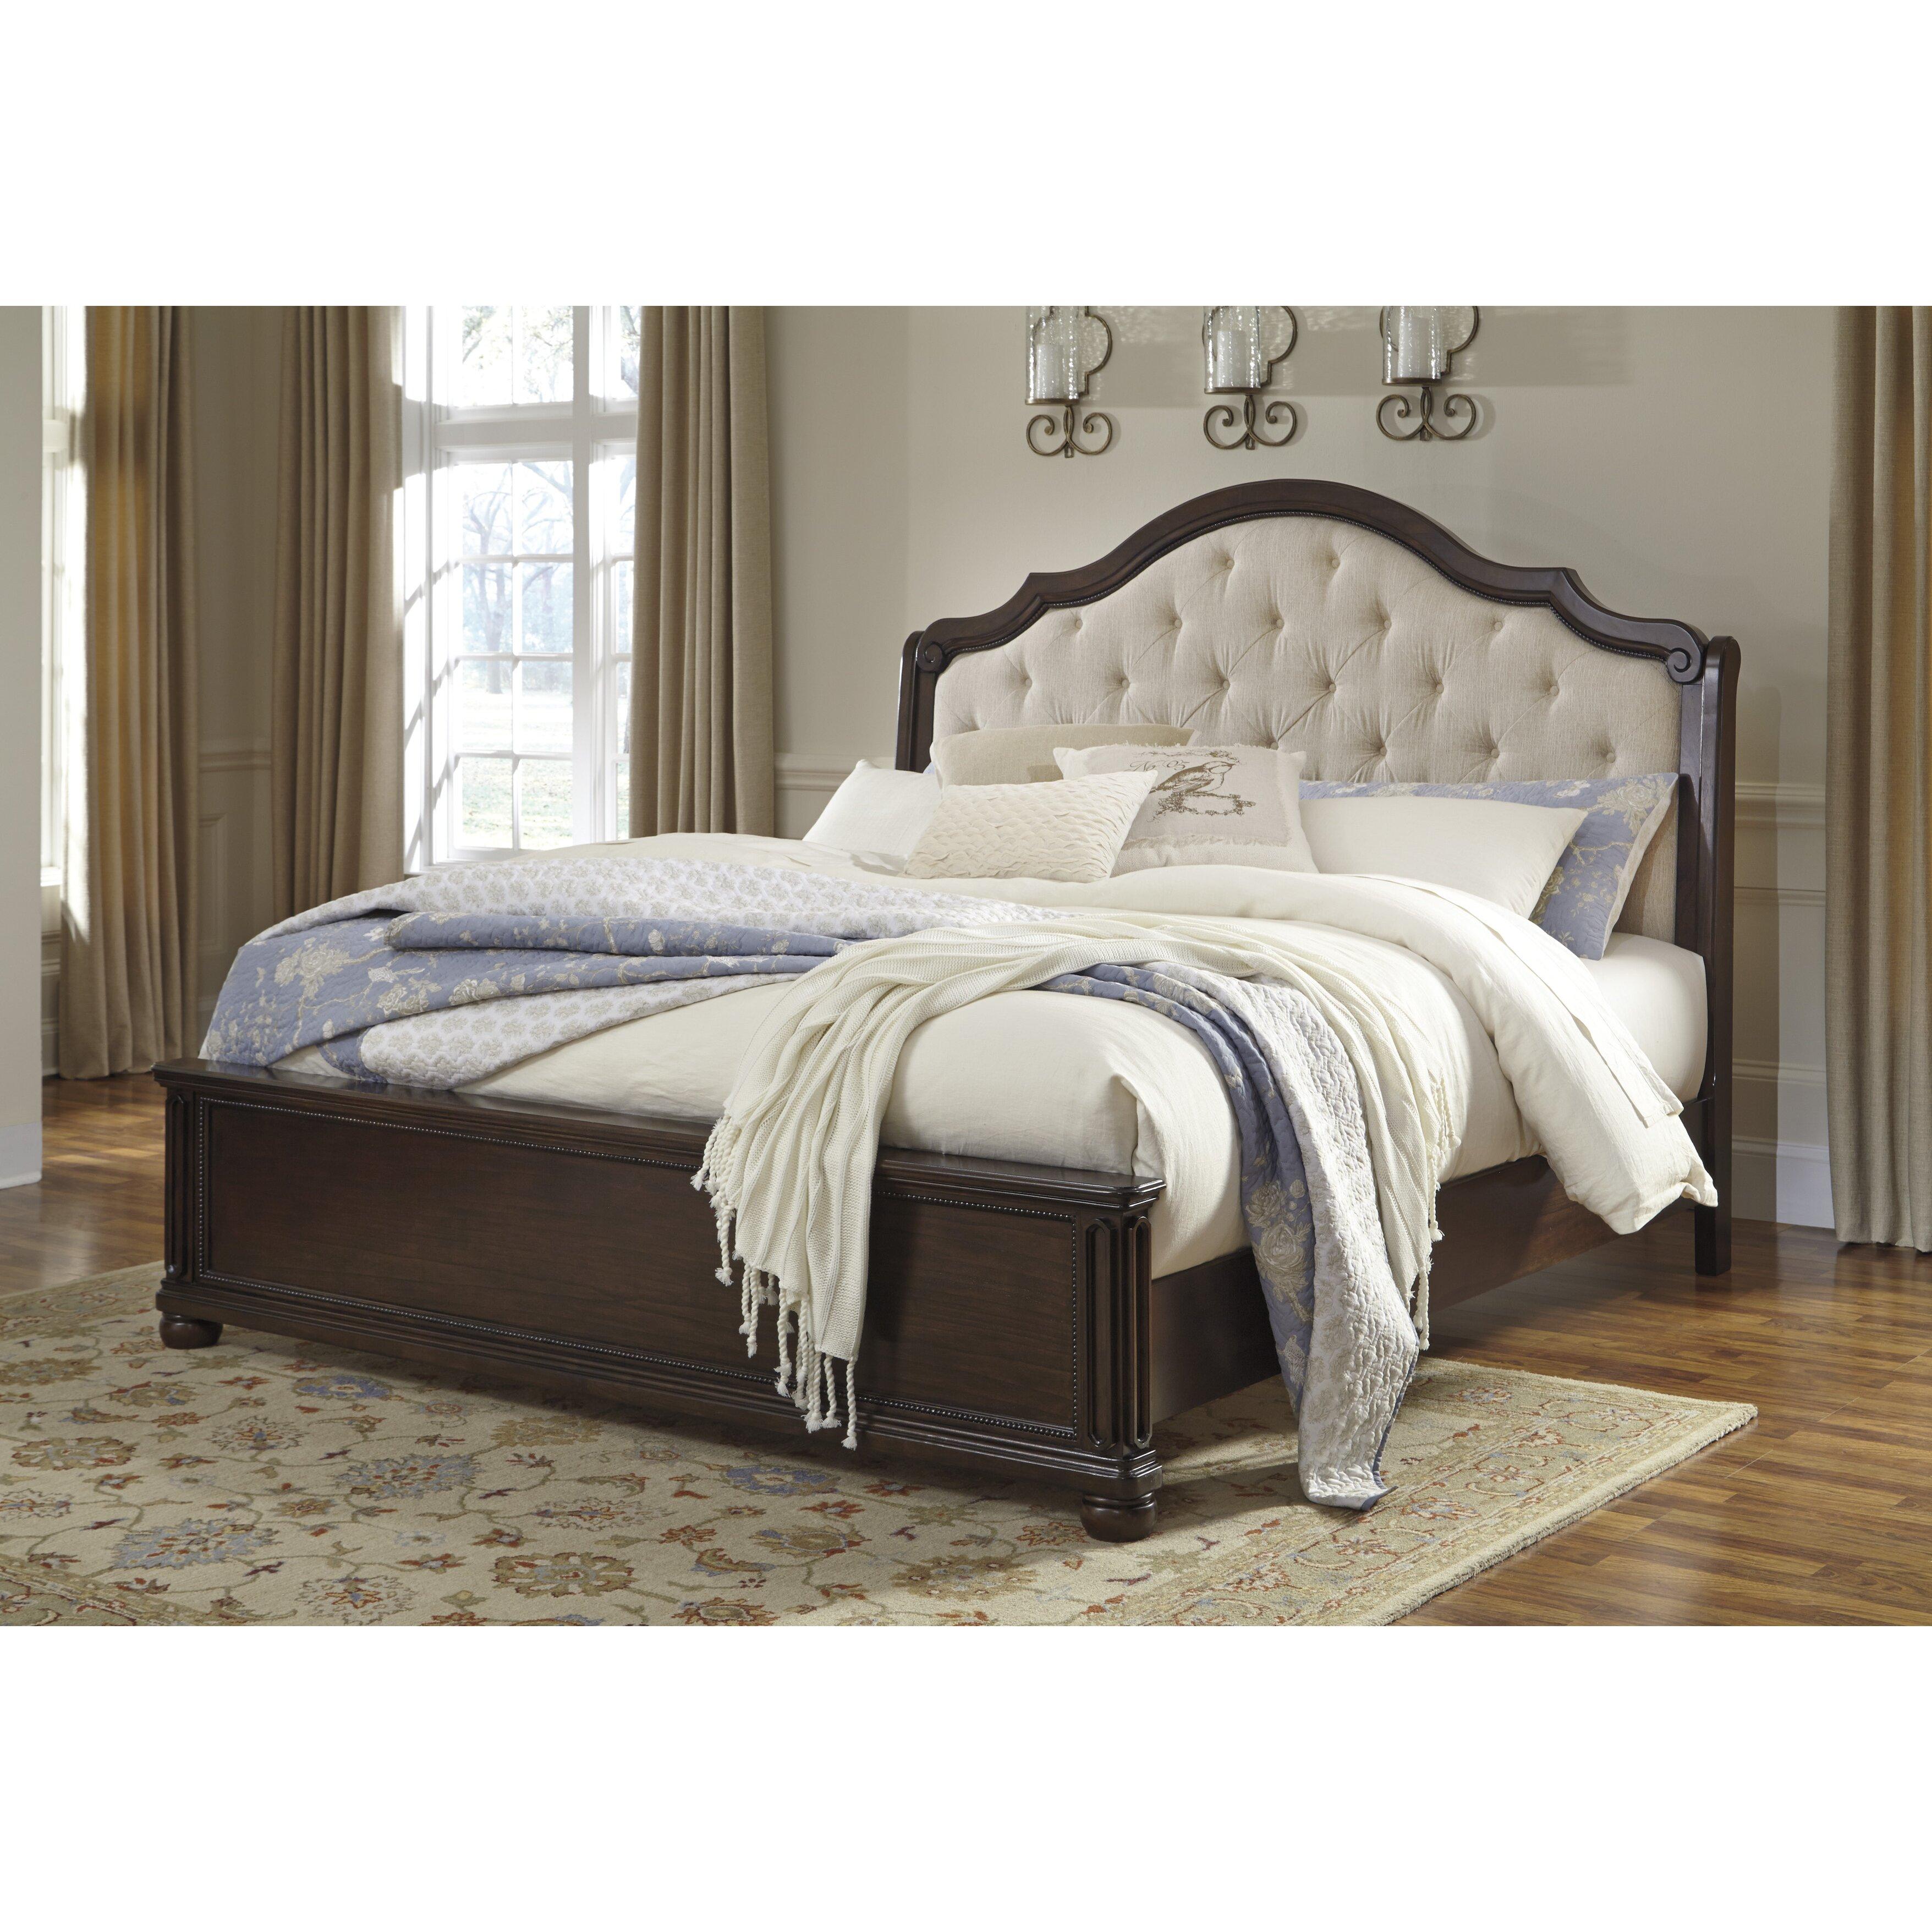 Signature design by ashley moluxy sleigh headboard - Ashley furniture sleigh bedroom set ...